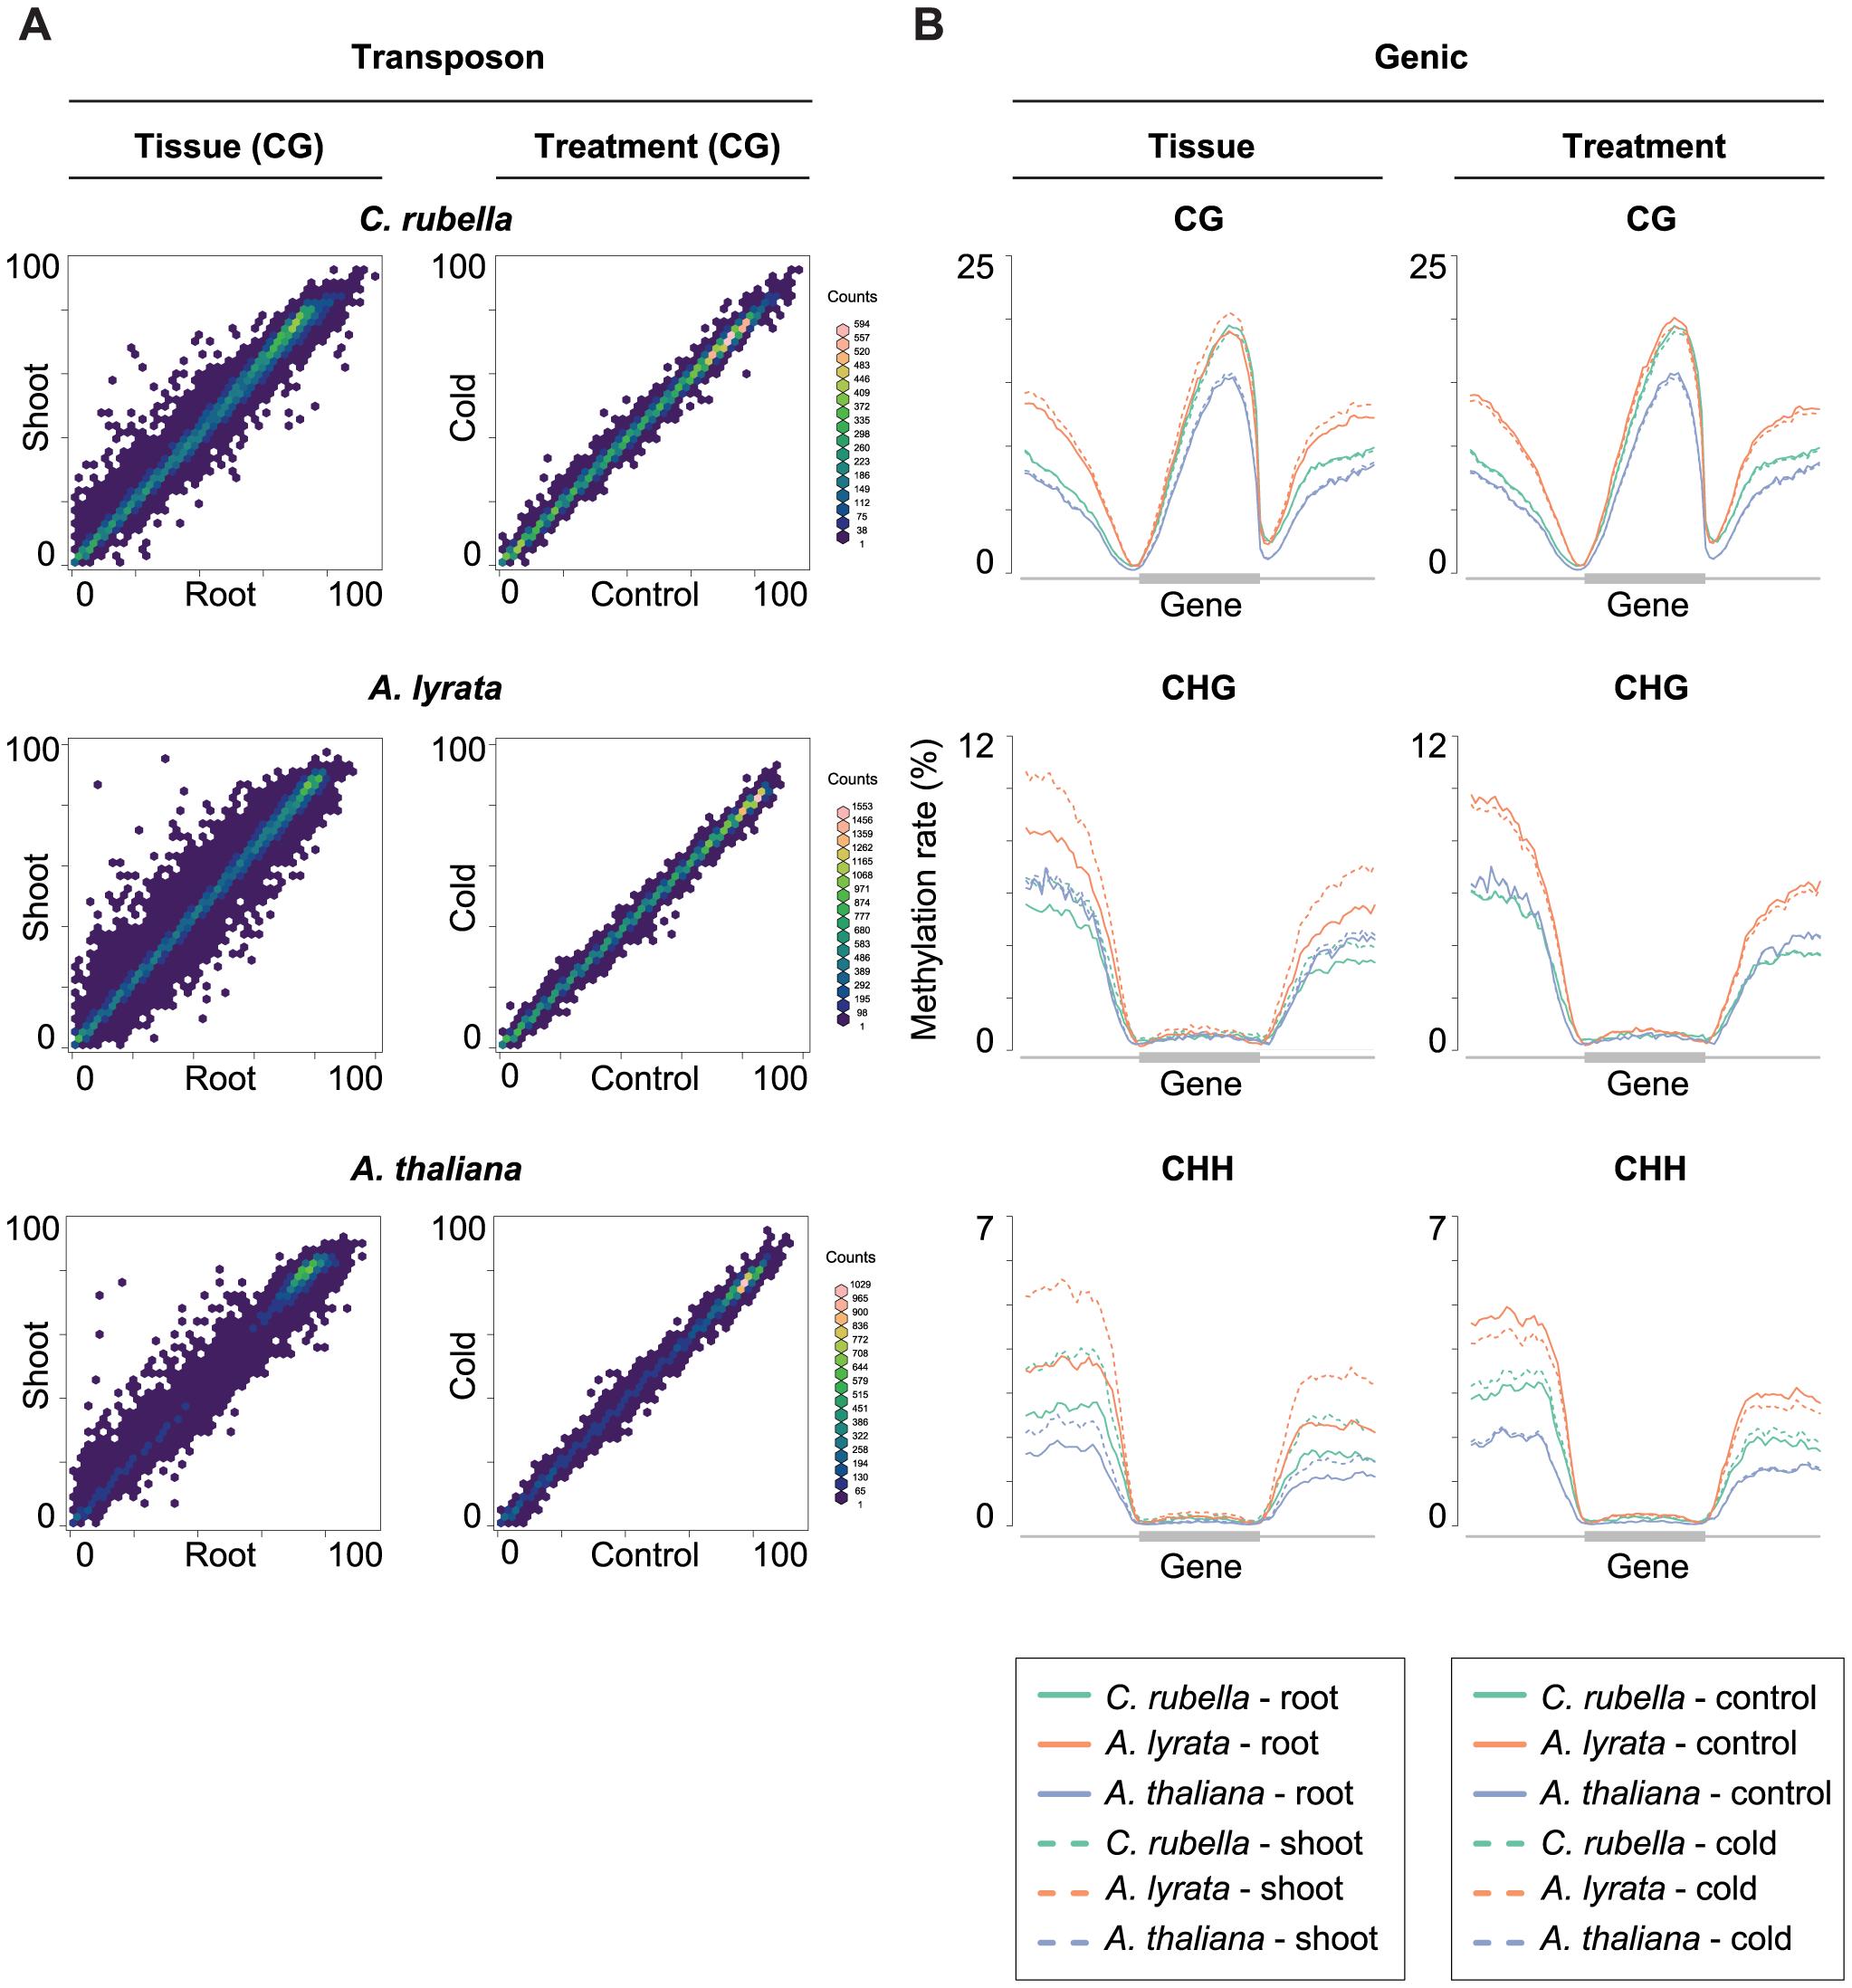 Intraspecific variation of transposon and gene body methylation.